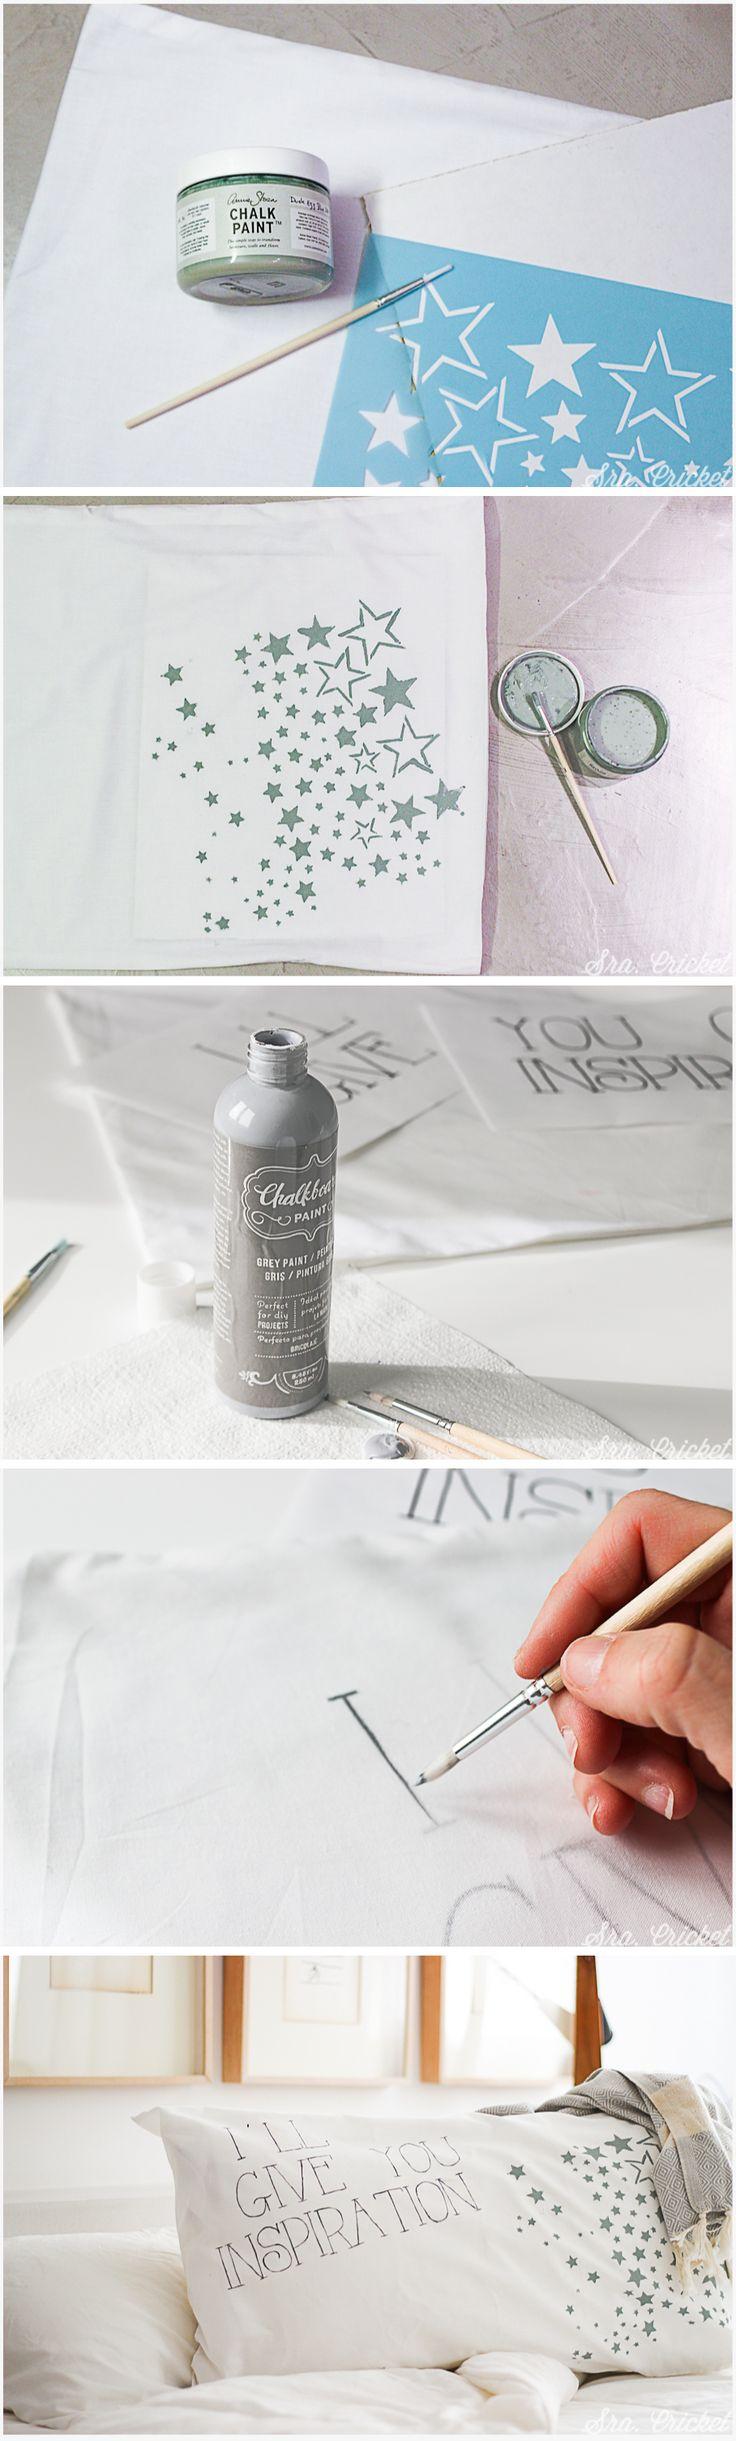 pintar-tela-con-chalk-paint-funda-almohada-by-sracricket-com